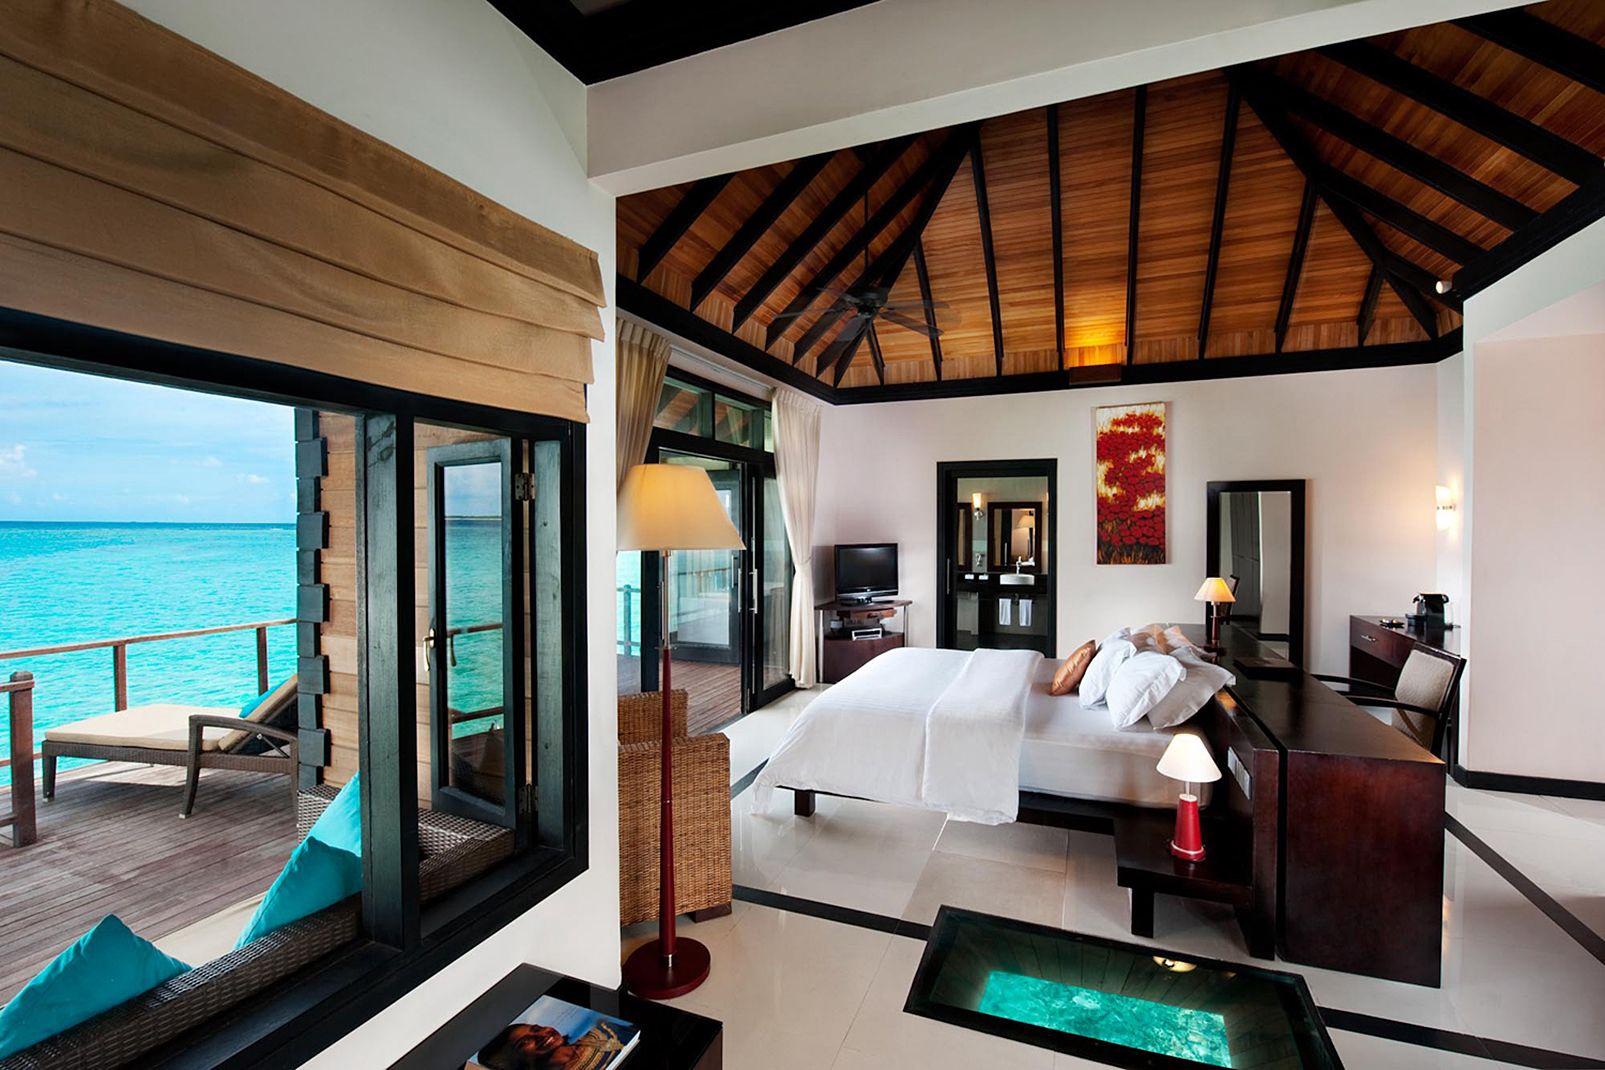 Hôtel The Sun Siyam Iru Fushi Maldives 5* - 1